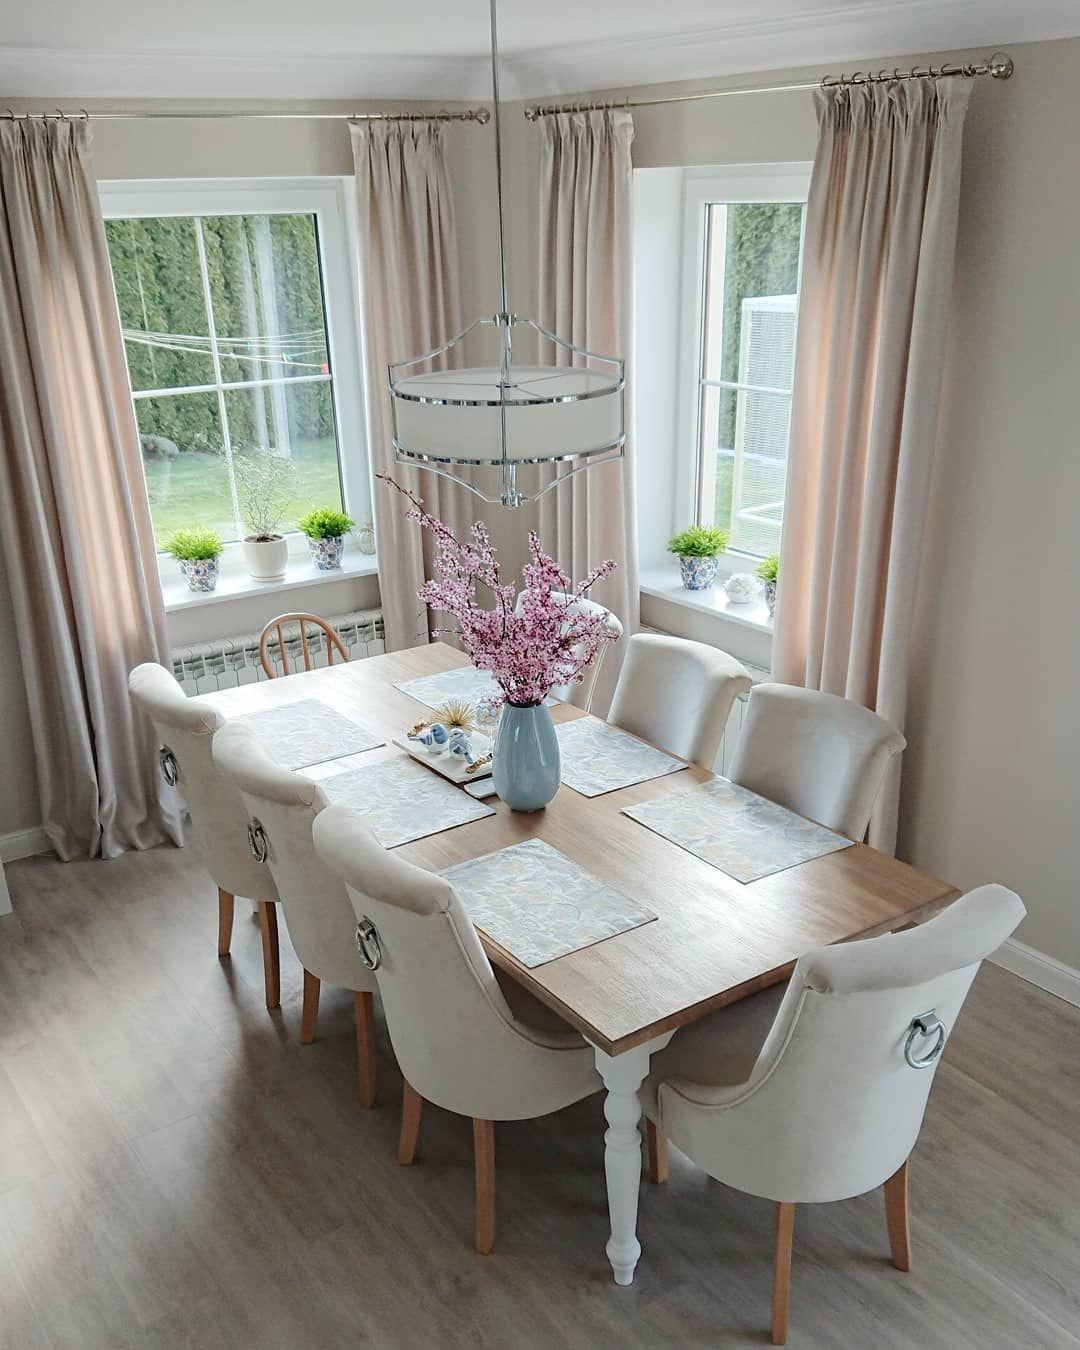 IG: cysiowy_domek #chair #diningroom #inspo #interiordesign #home #food #familytime #interiordesign #howtodecorate #furniture #furnishingwithDomArtStyl